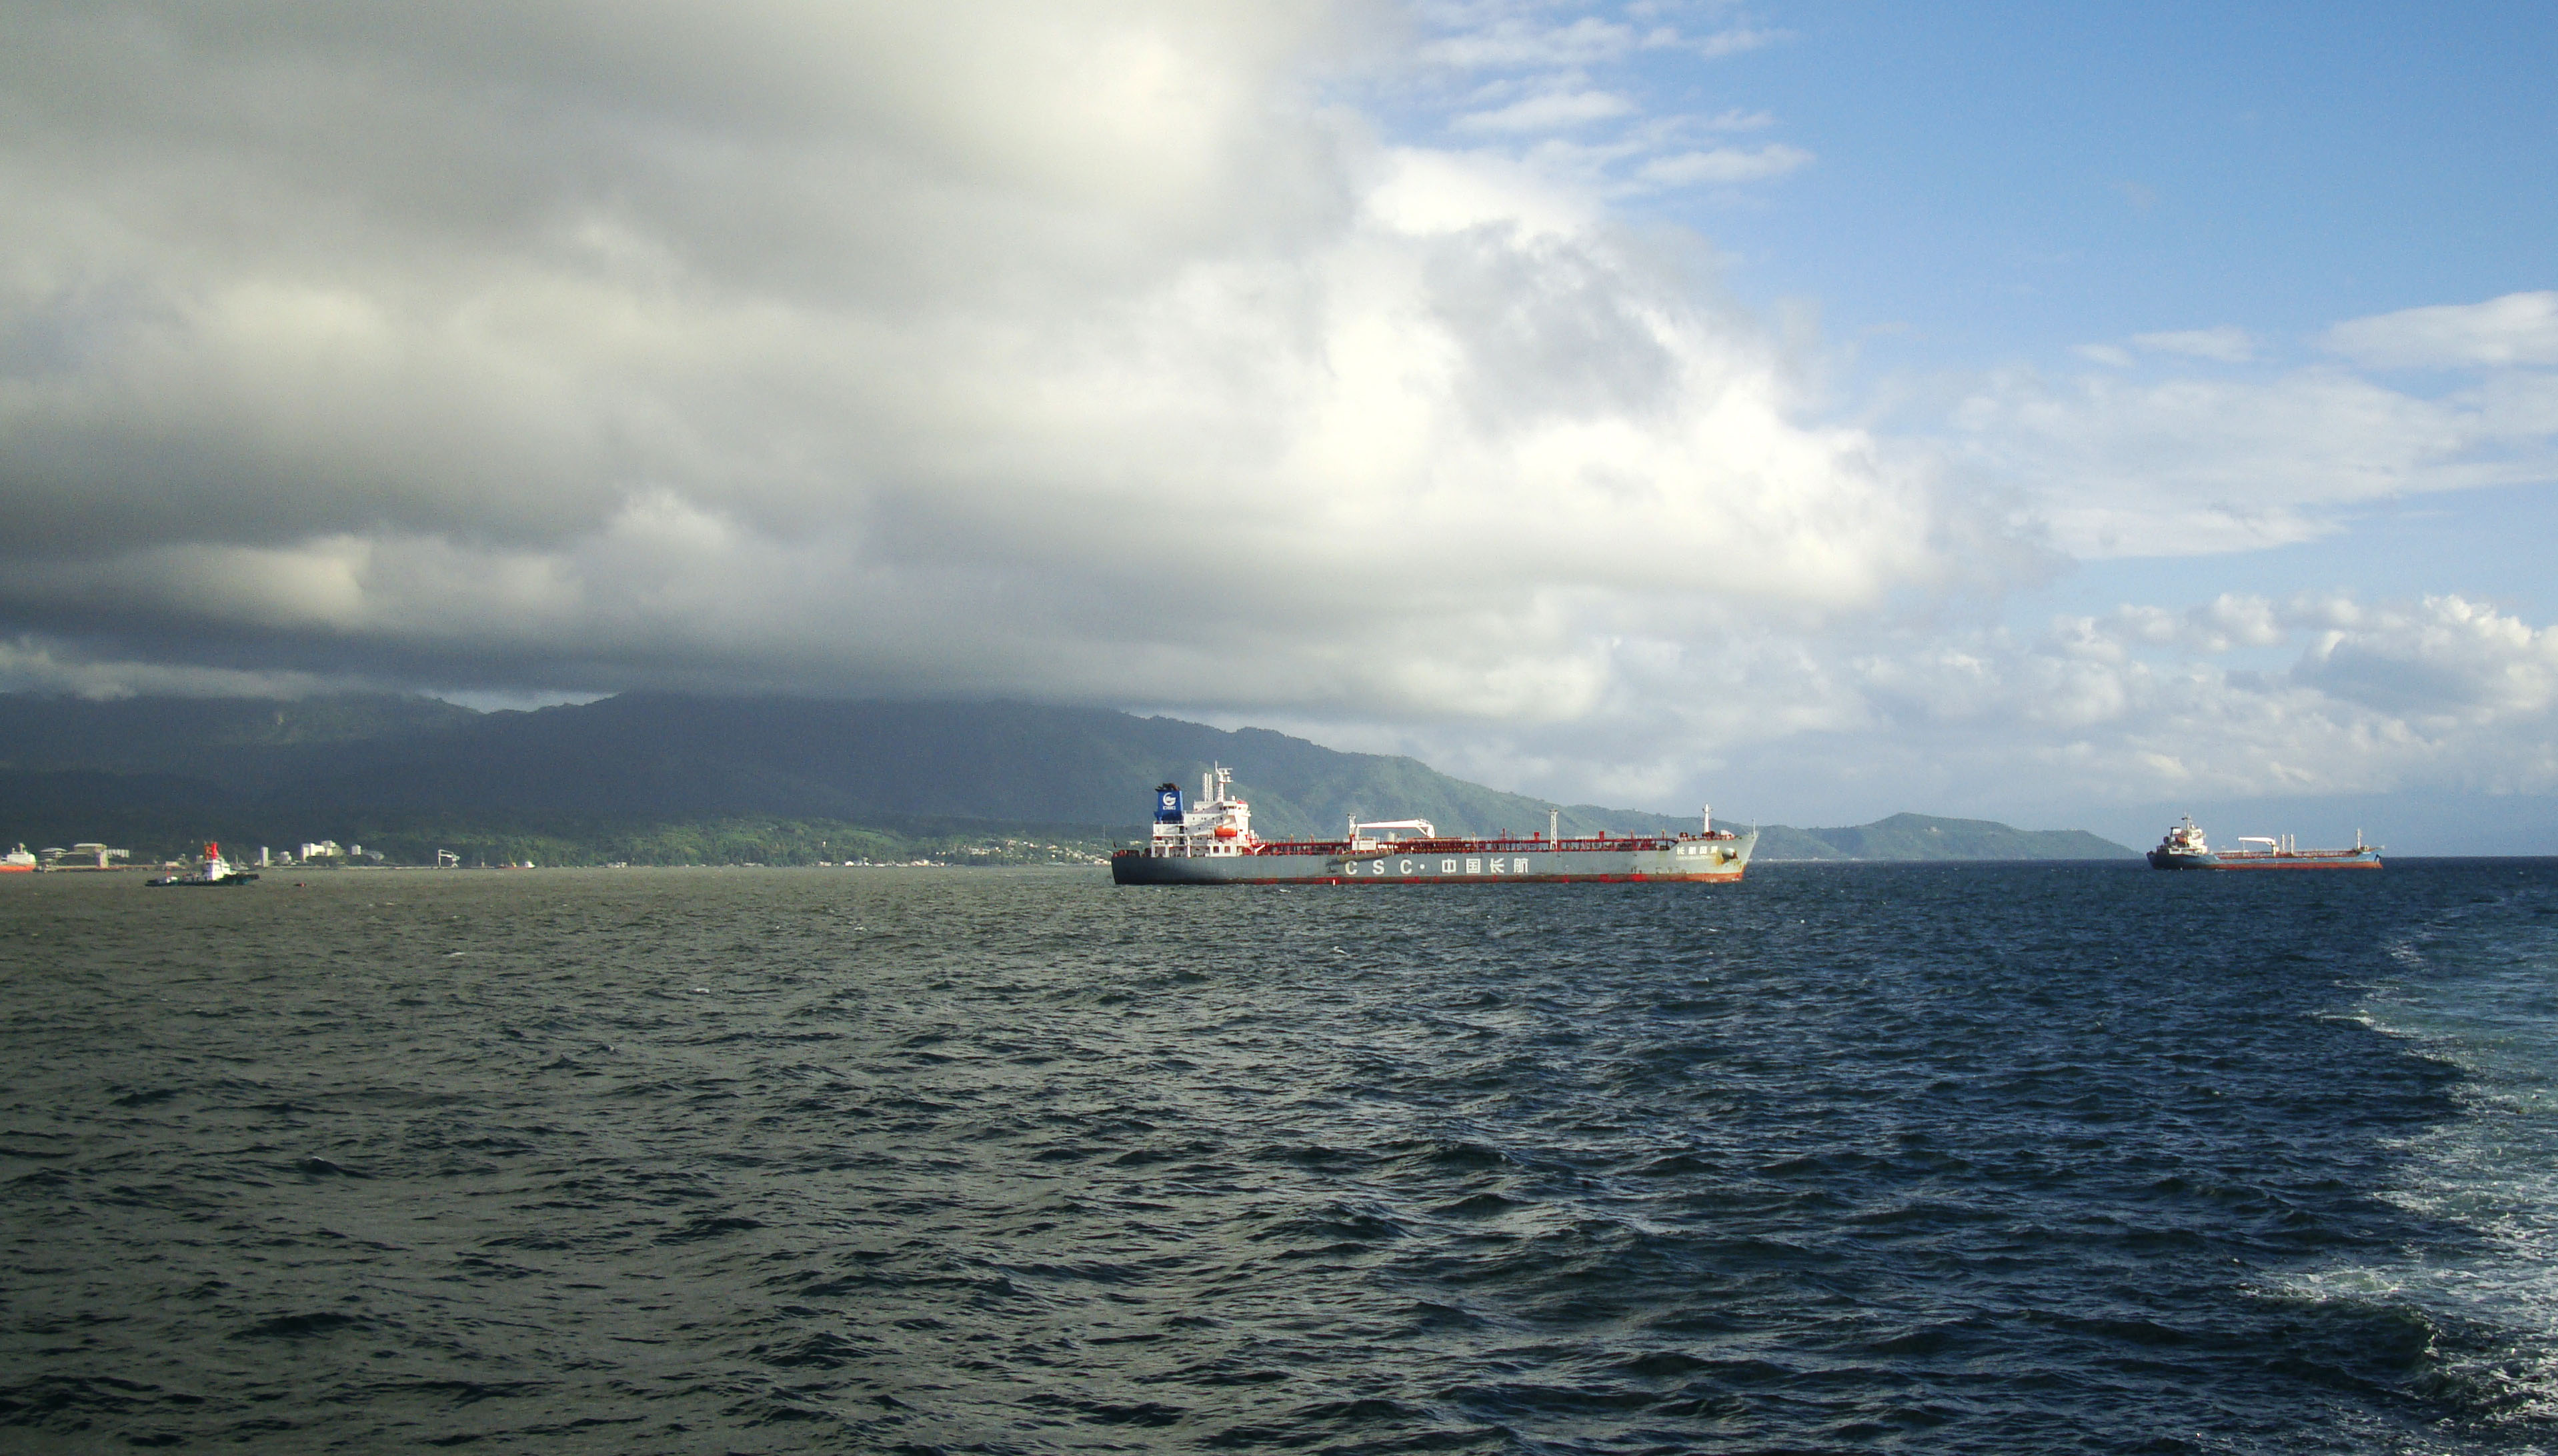 MV CSC Changhangfenggai Batangus Philppines 2010 06